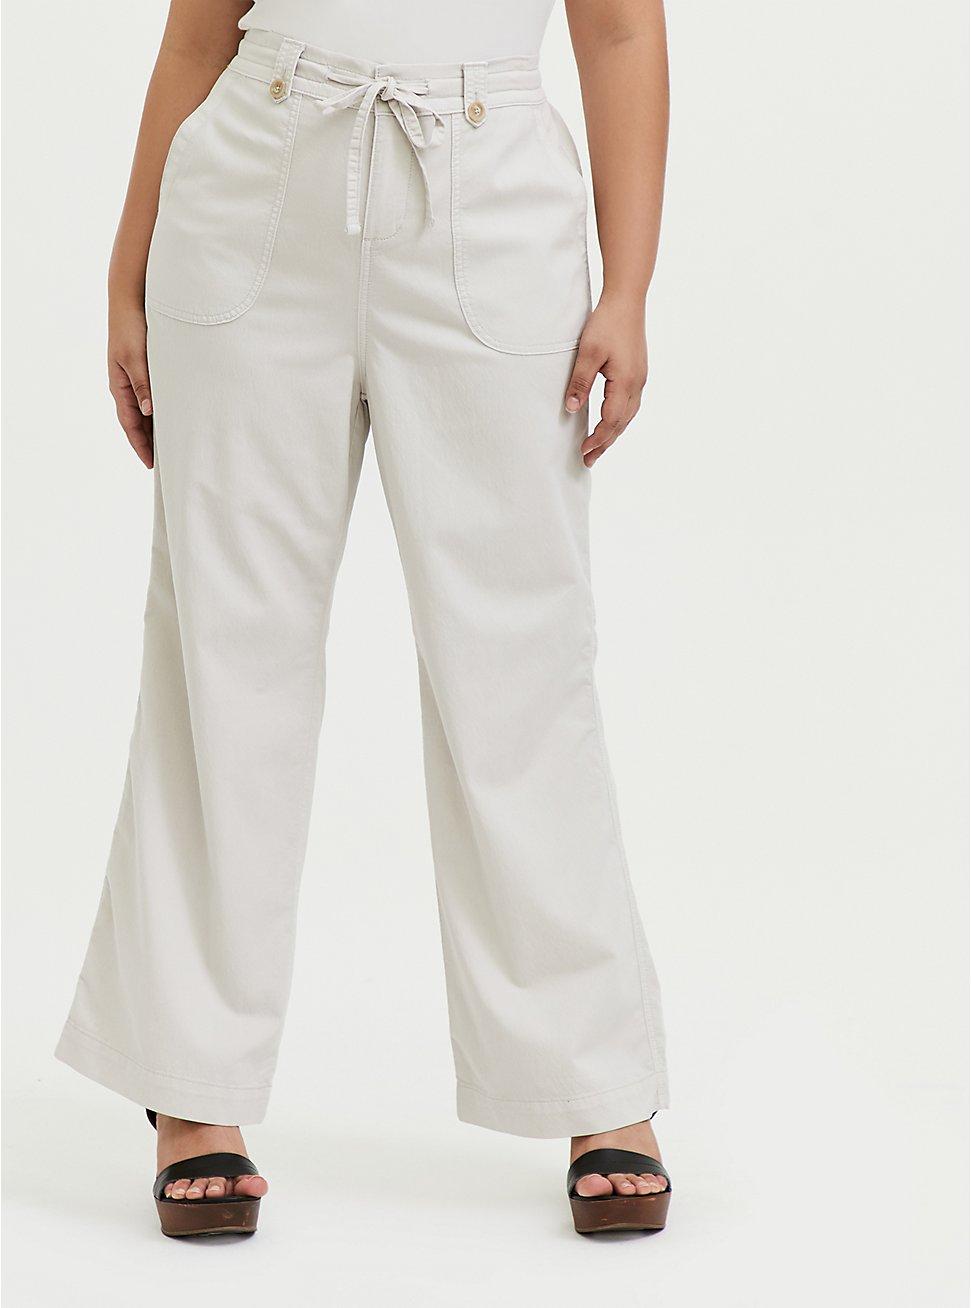 Plus Size Ivory Drawstring Wide Leg Pant, WIND CHIME, hi-res